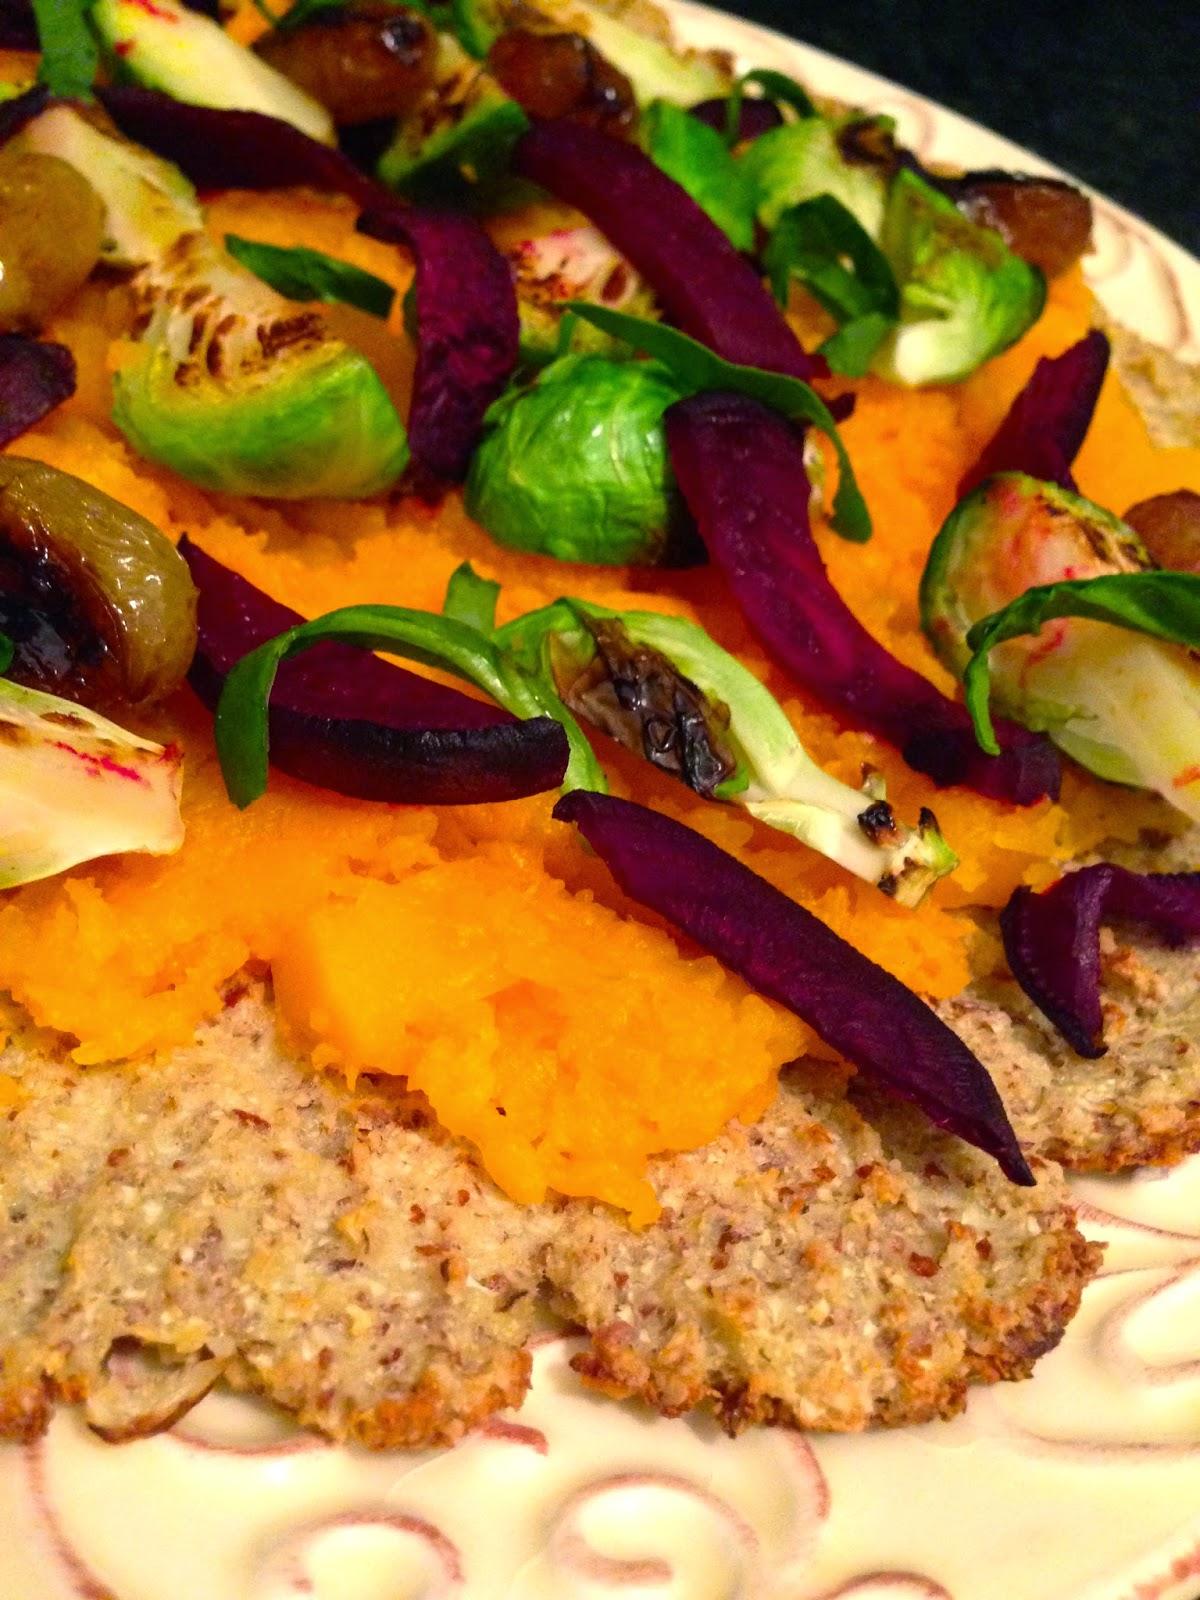 Roasted Veggie Flatbread Pizza by BeautyBeyondBones - #glutenfree #grainfree #vegan #vegetarian #paleo #keto #edrecovery #recovery #food #specificcarbohydratediet